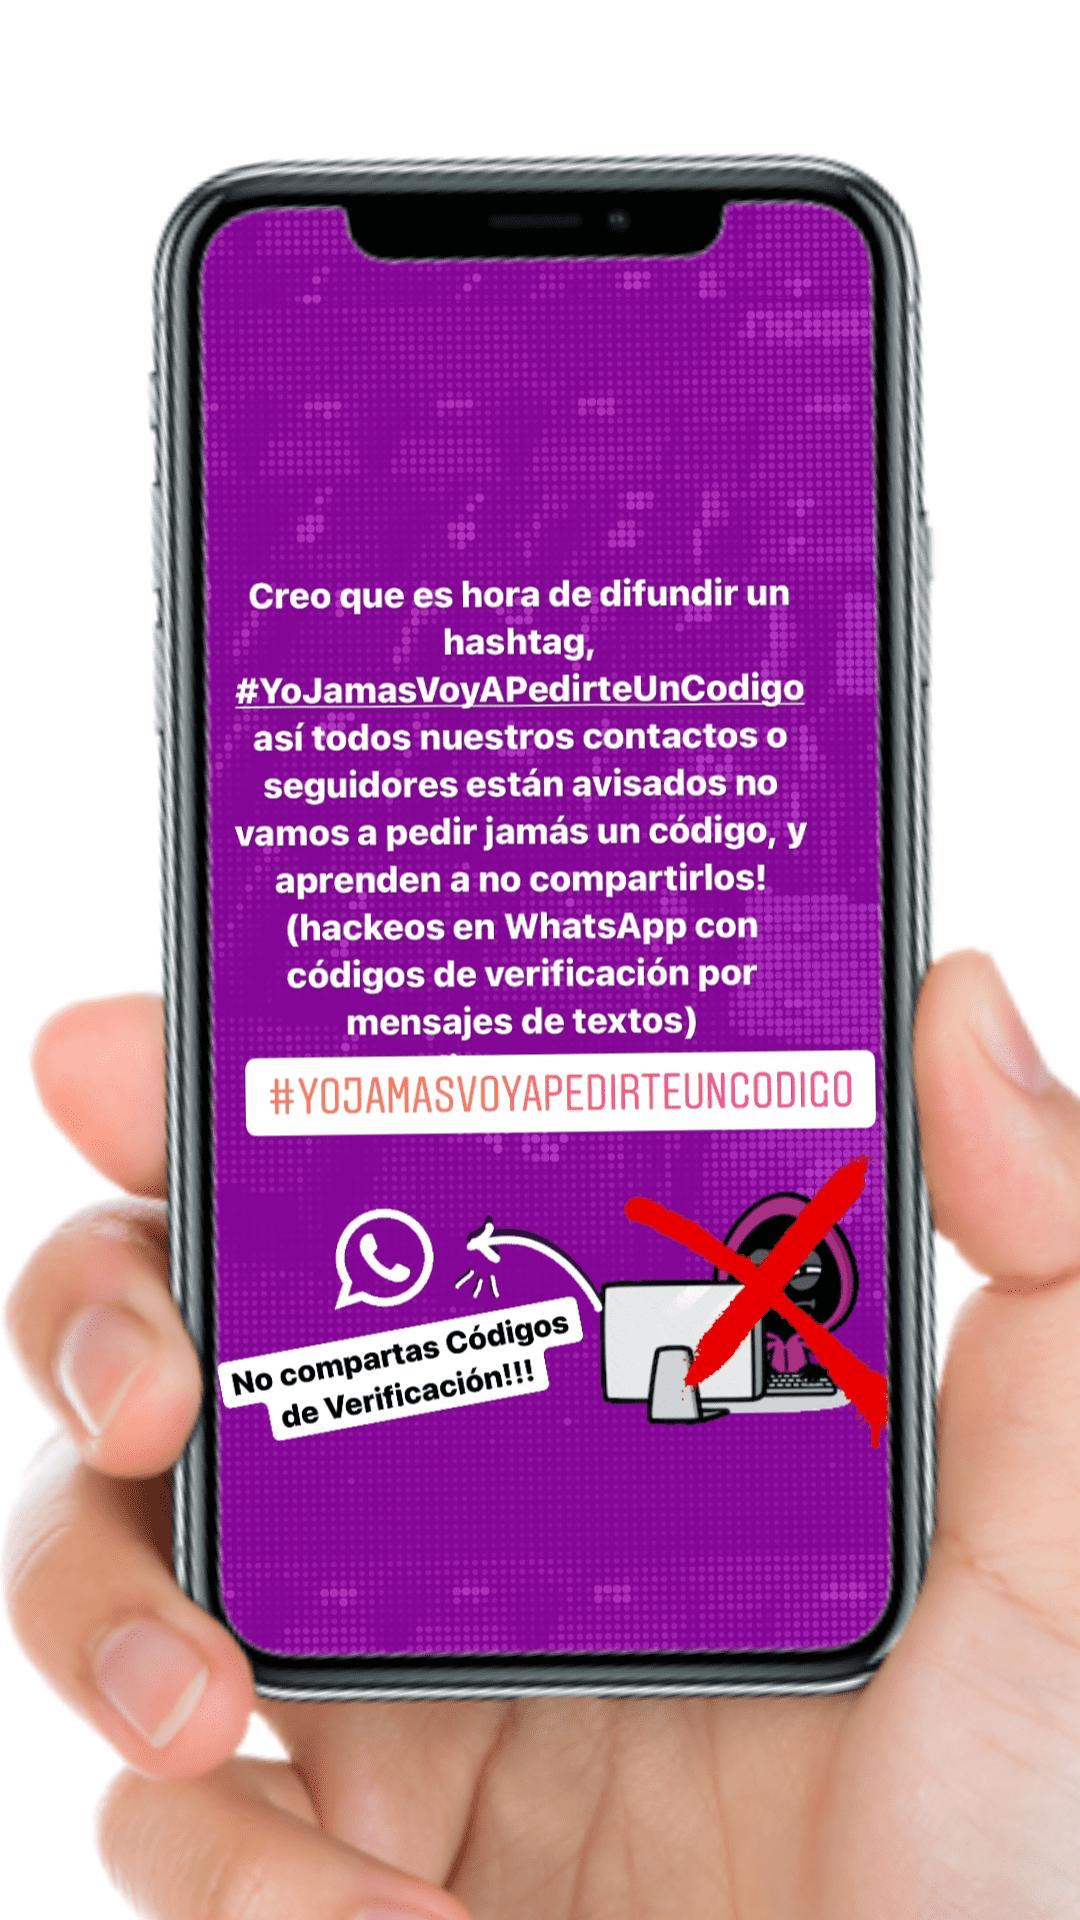 Alerta de hackeo en WhatsApp!!!